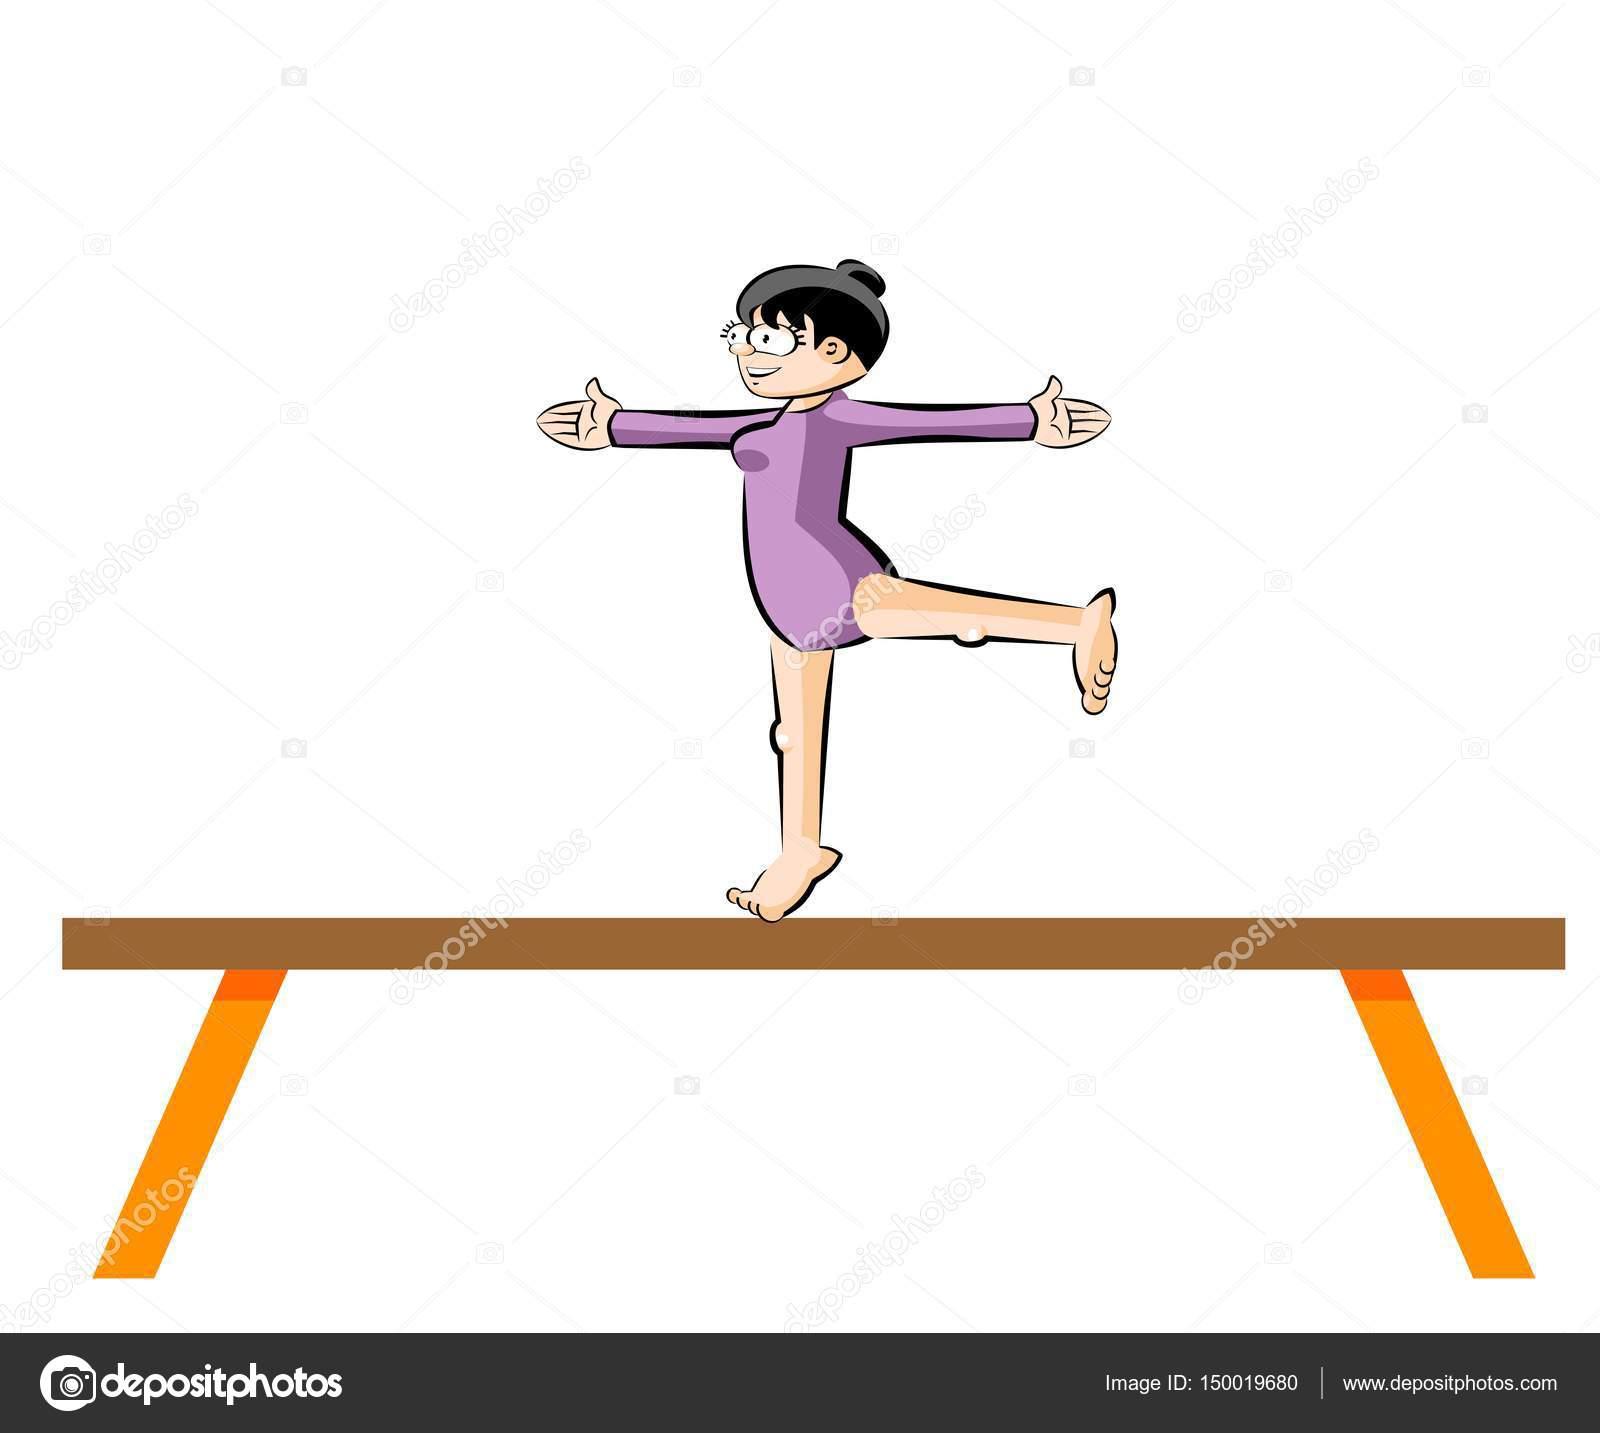 gimnasia femenina en viga de equilibrio vector de stock photoestelar 150019680. Black Bedroom Furniture Sets. Home Design Ideas